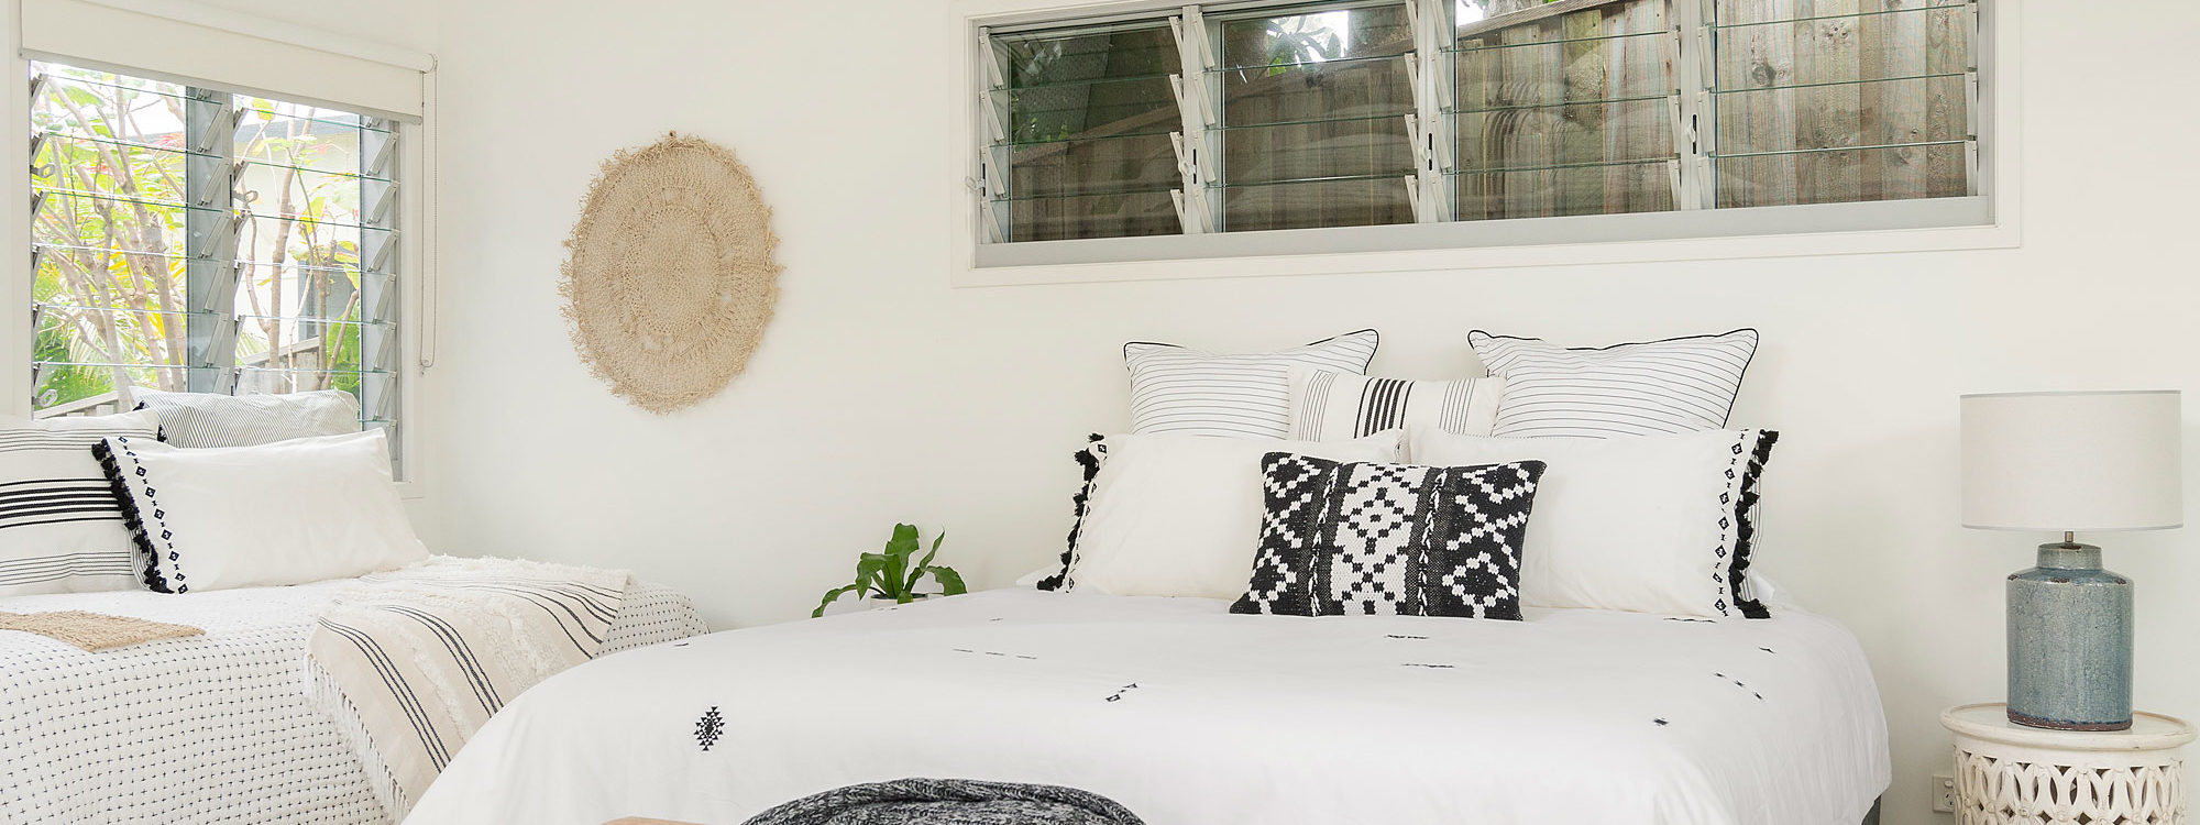 The White Rabbit - Byron Bay - Studio Bedroom b